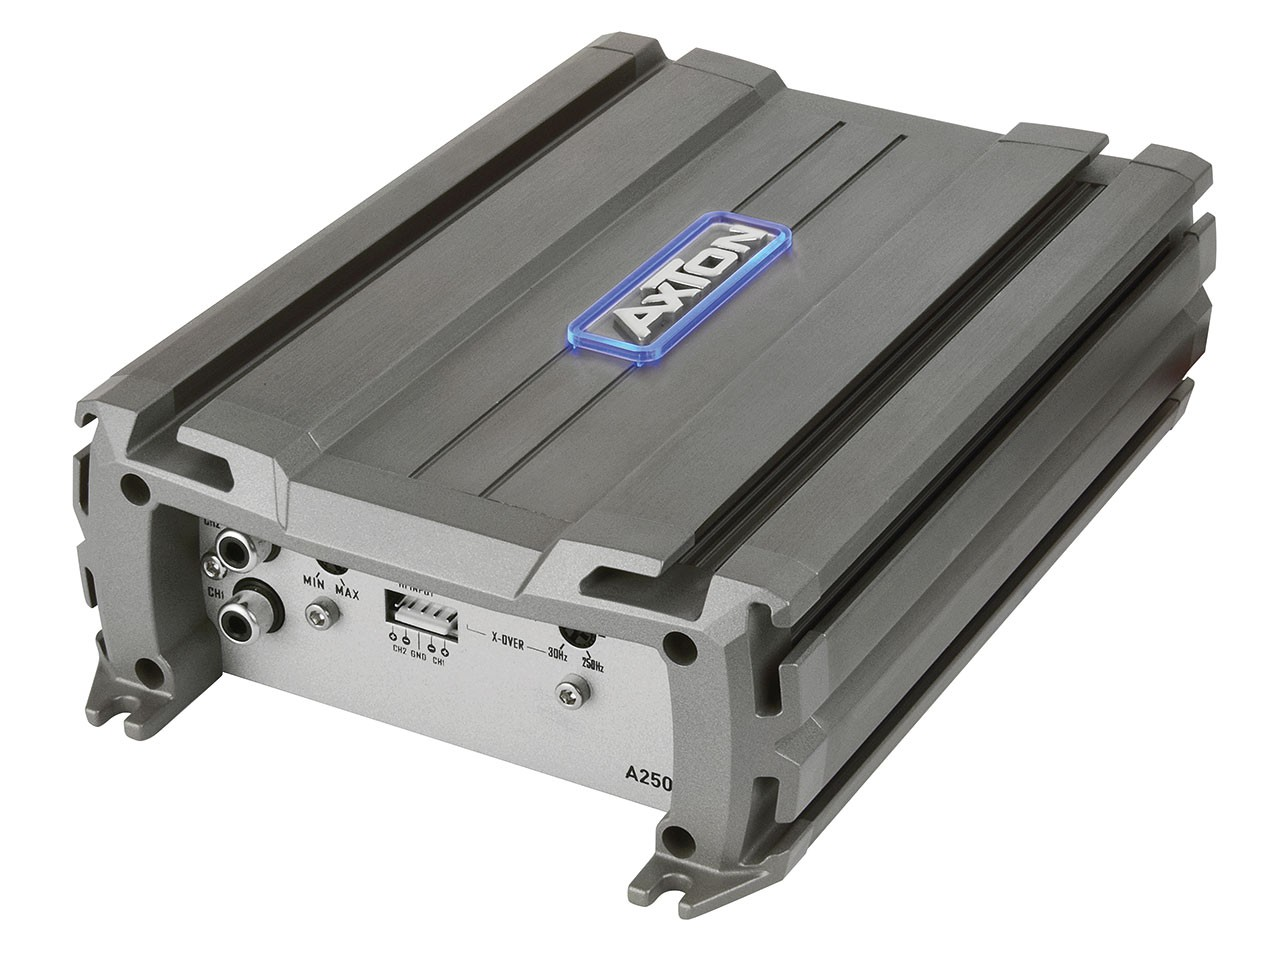 A250 - AXTON Amplifier 2 x 57 Watt